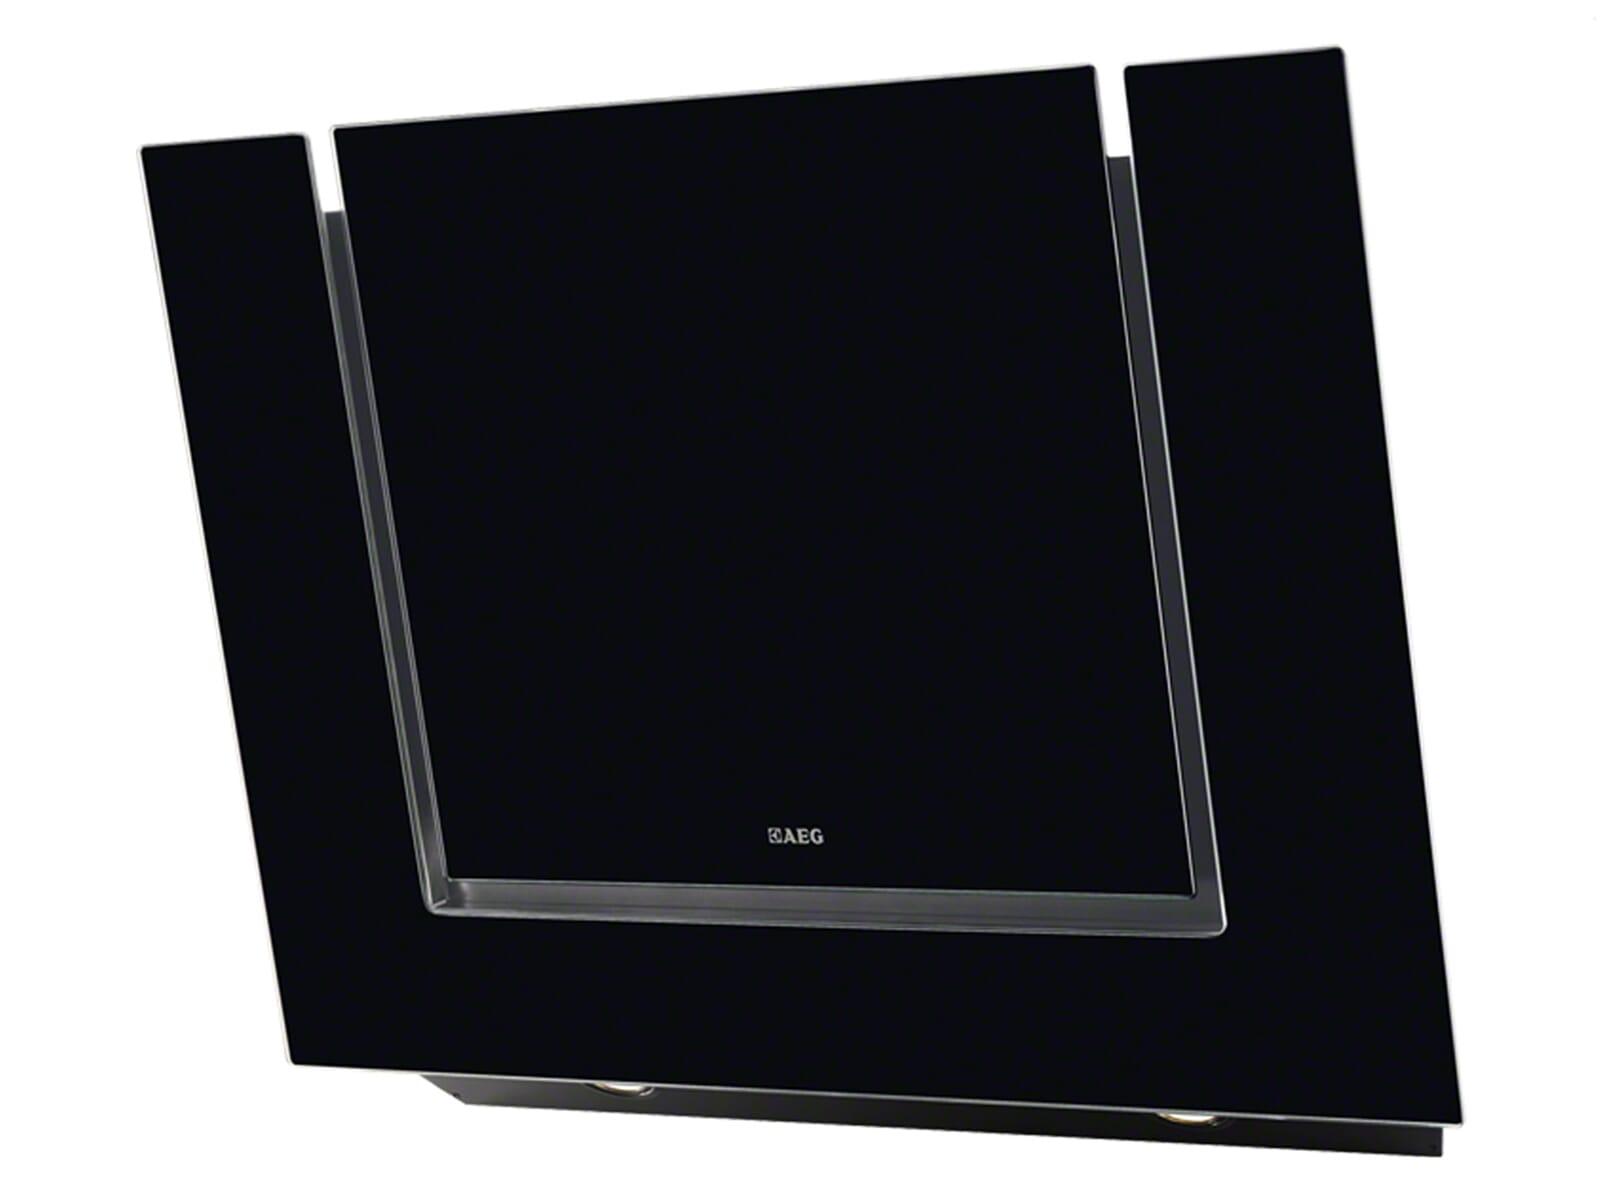 aeg x68163bv10 kopffrei wand dunstabzugshaube schwarz kopffreihaube 80cm esse. Black Bedroom Furniture Sets. Home Design Ideas